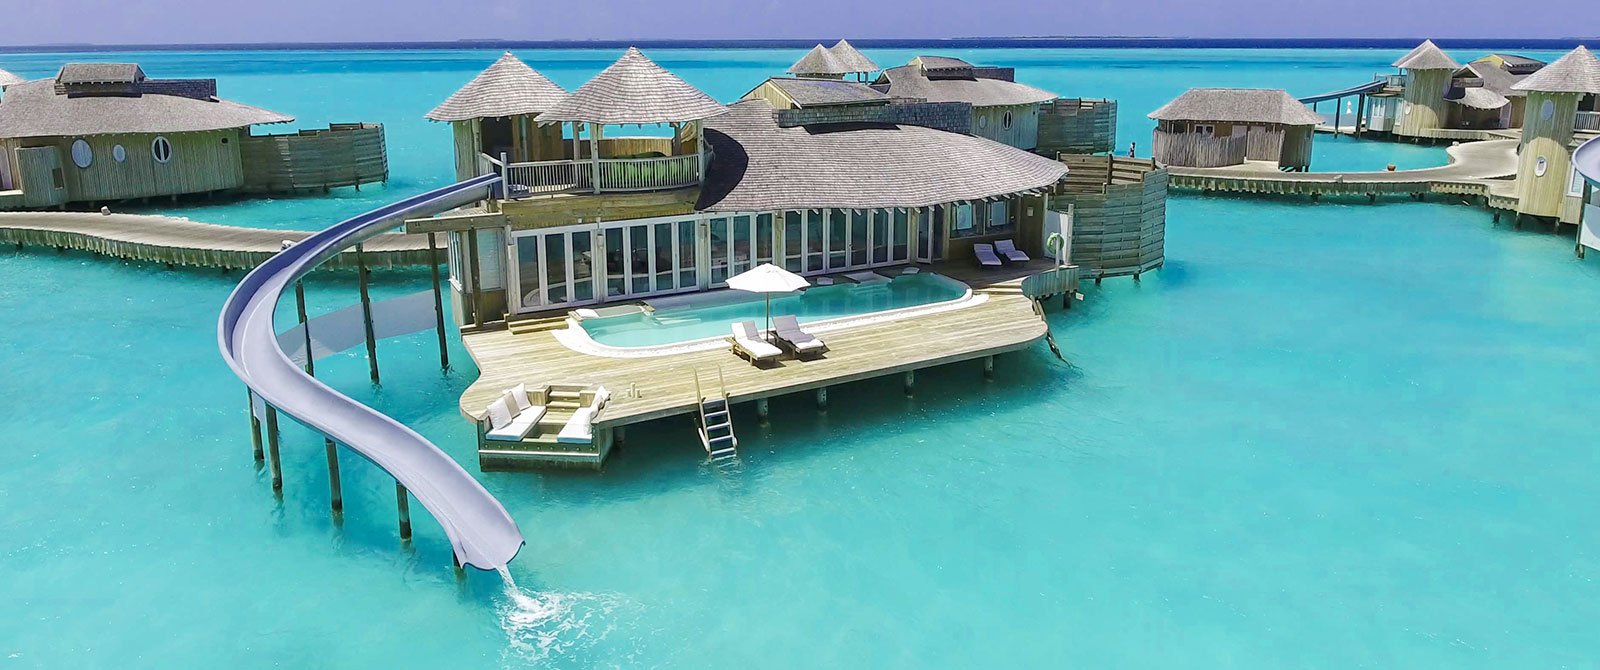 Soneva Jani Resort - 1 Bedroom Water Retreat with Slide - Maldives Overwater Bungalow Vacation